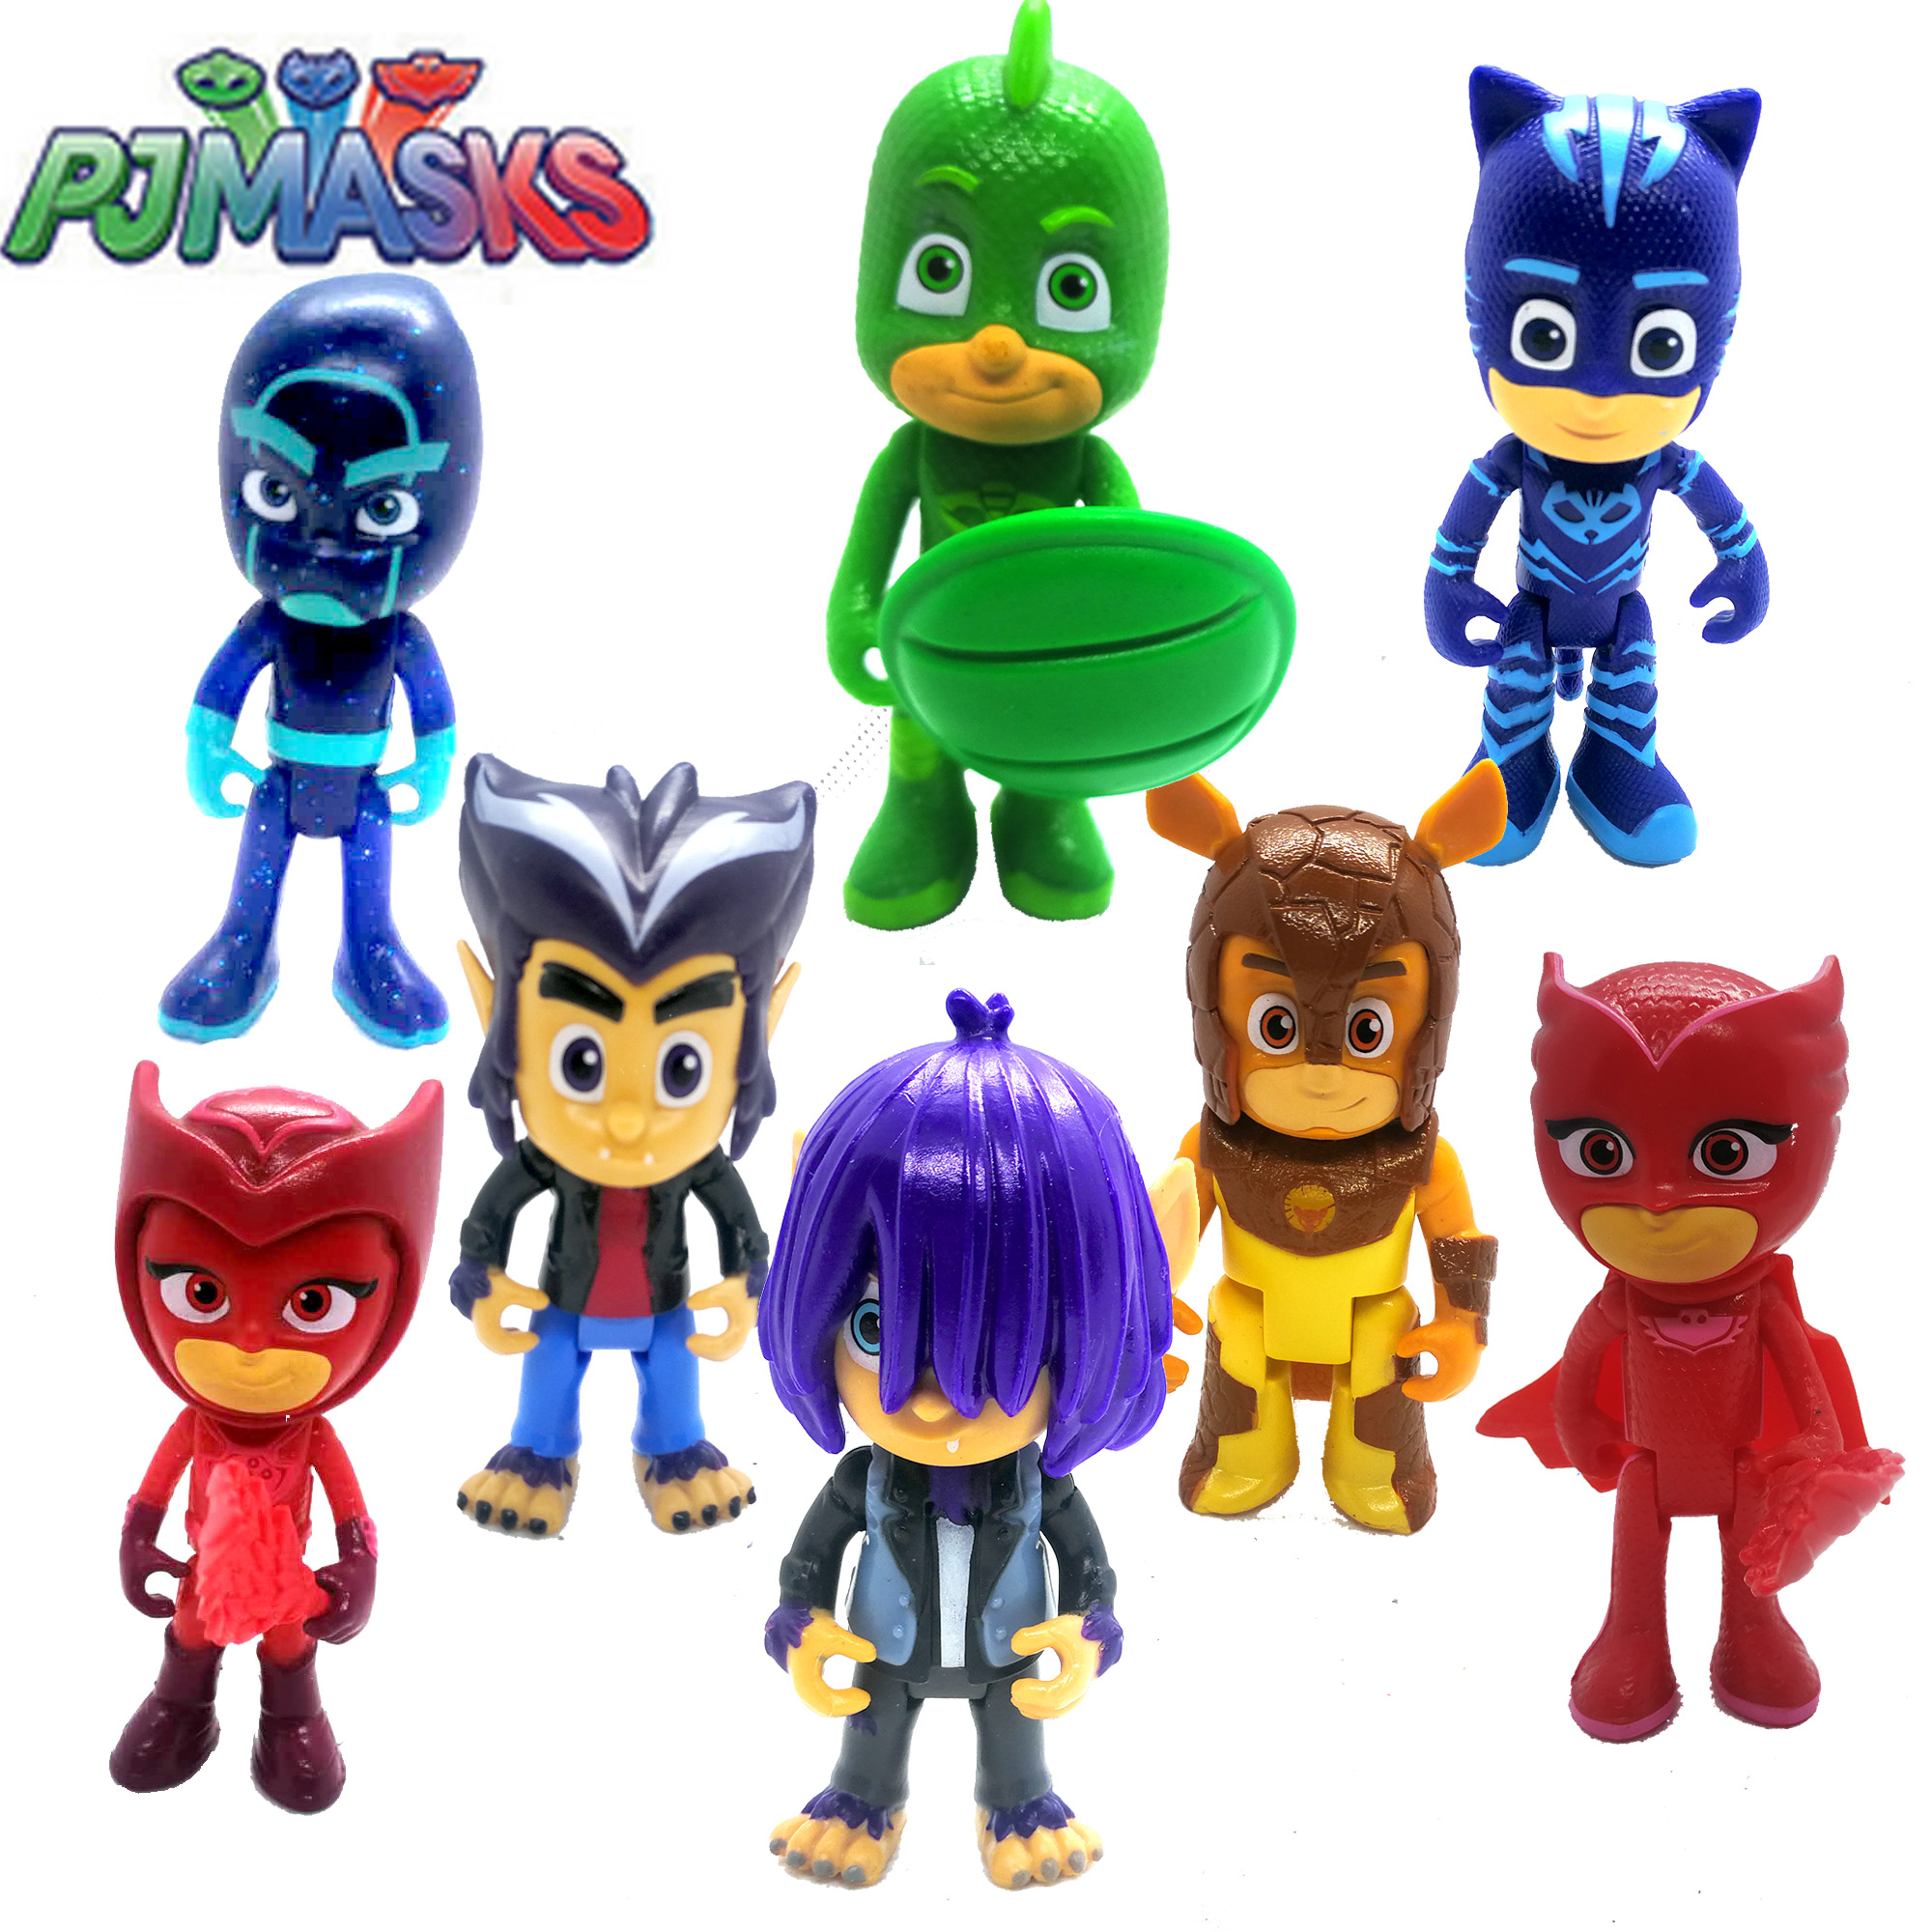 Genuine PJ Masks Figure Character Catboy Owlette Gekko Figures Anime With Arms Toys Birthday Gift OriginalToys For Children Boys